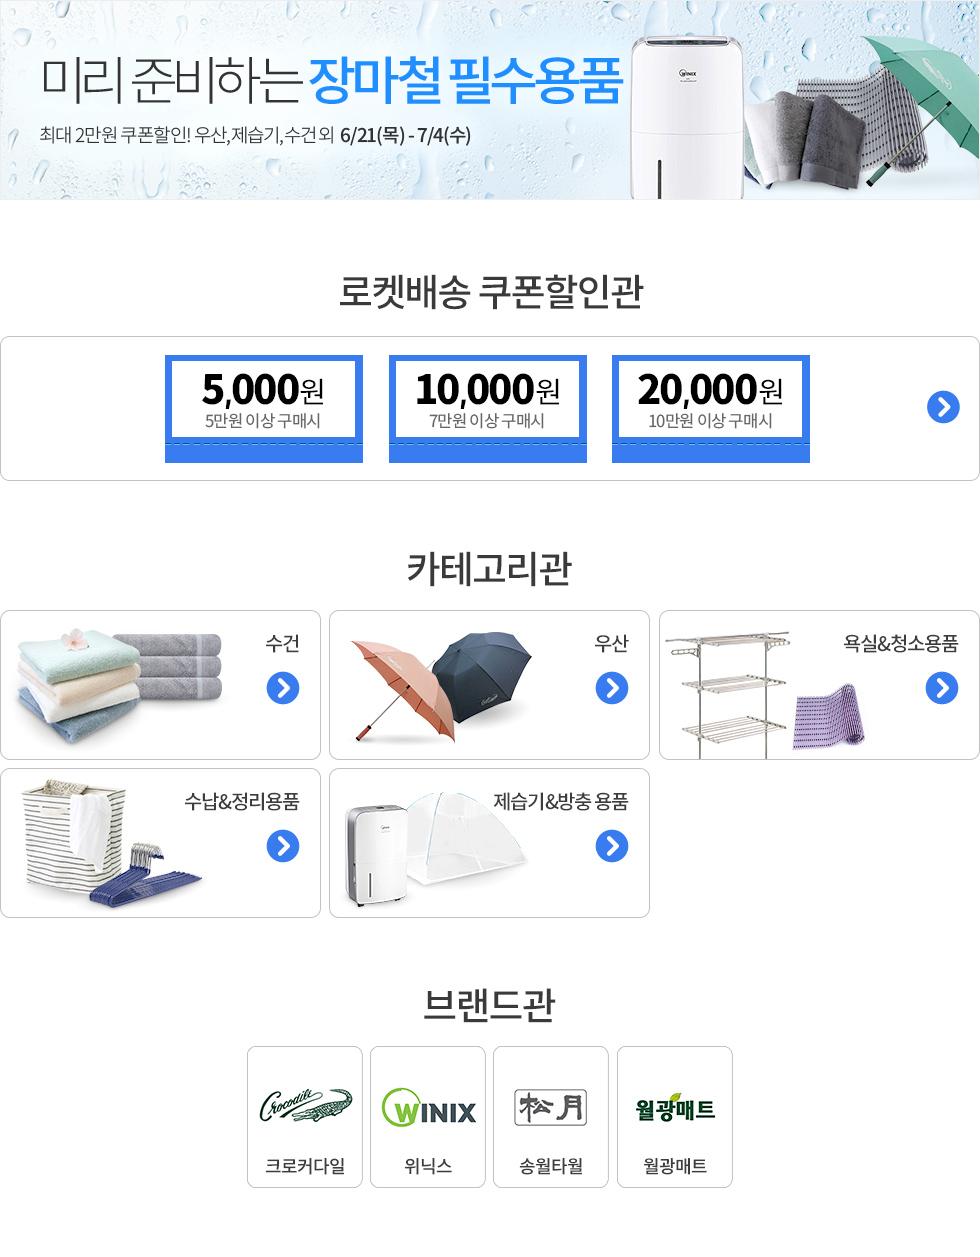 displayitem_563ebdc9-daac-4581-ac1a-04d1e0431051.jpg